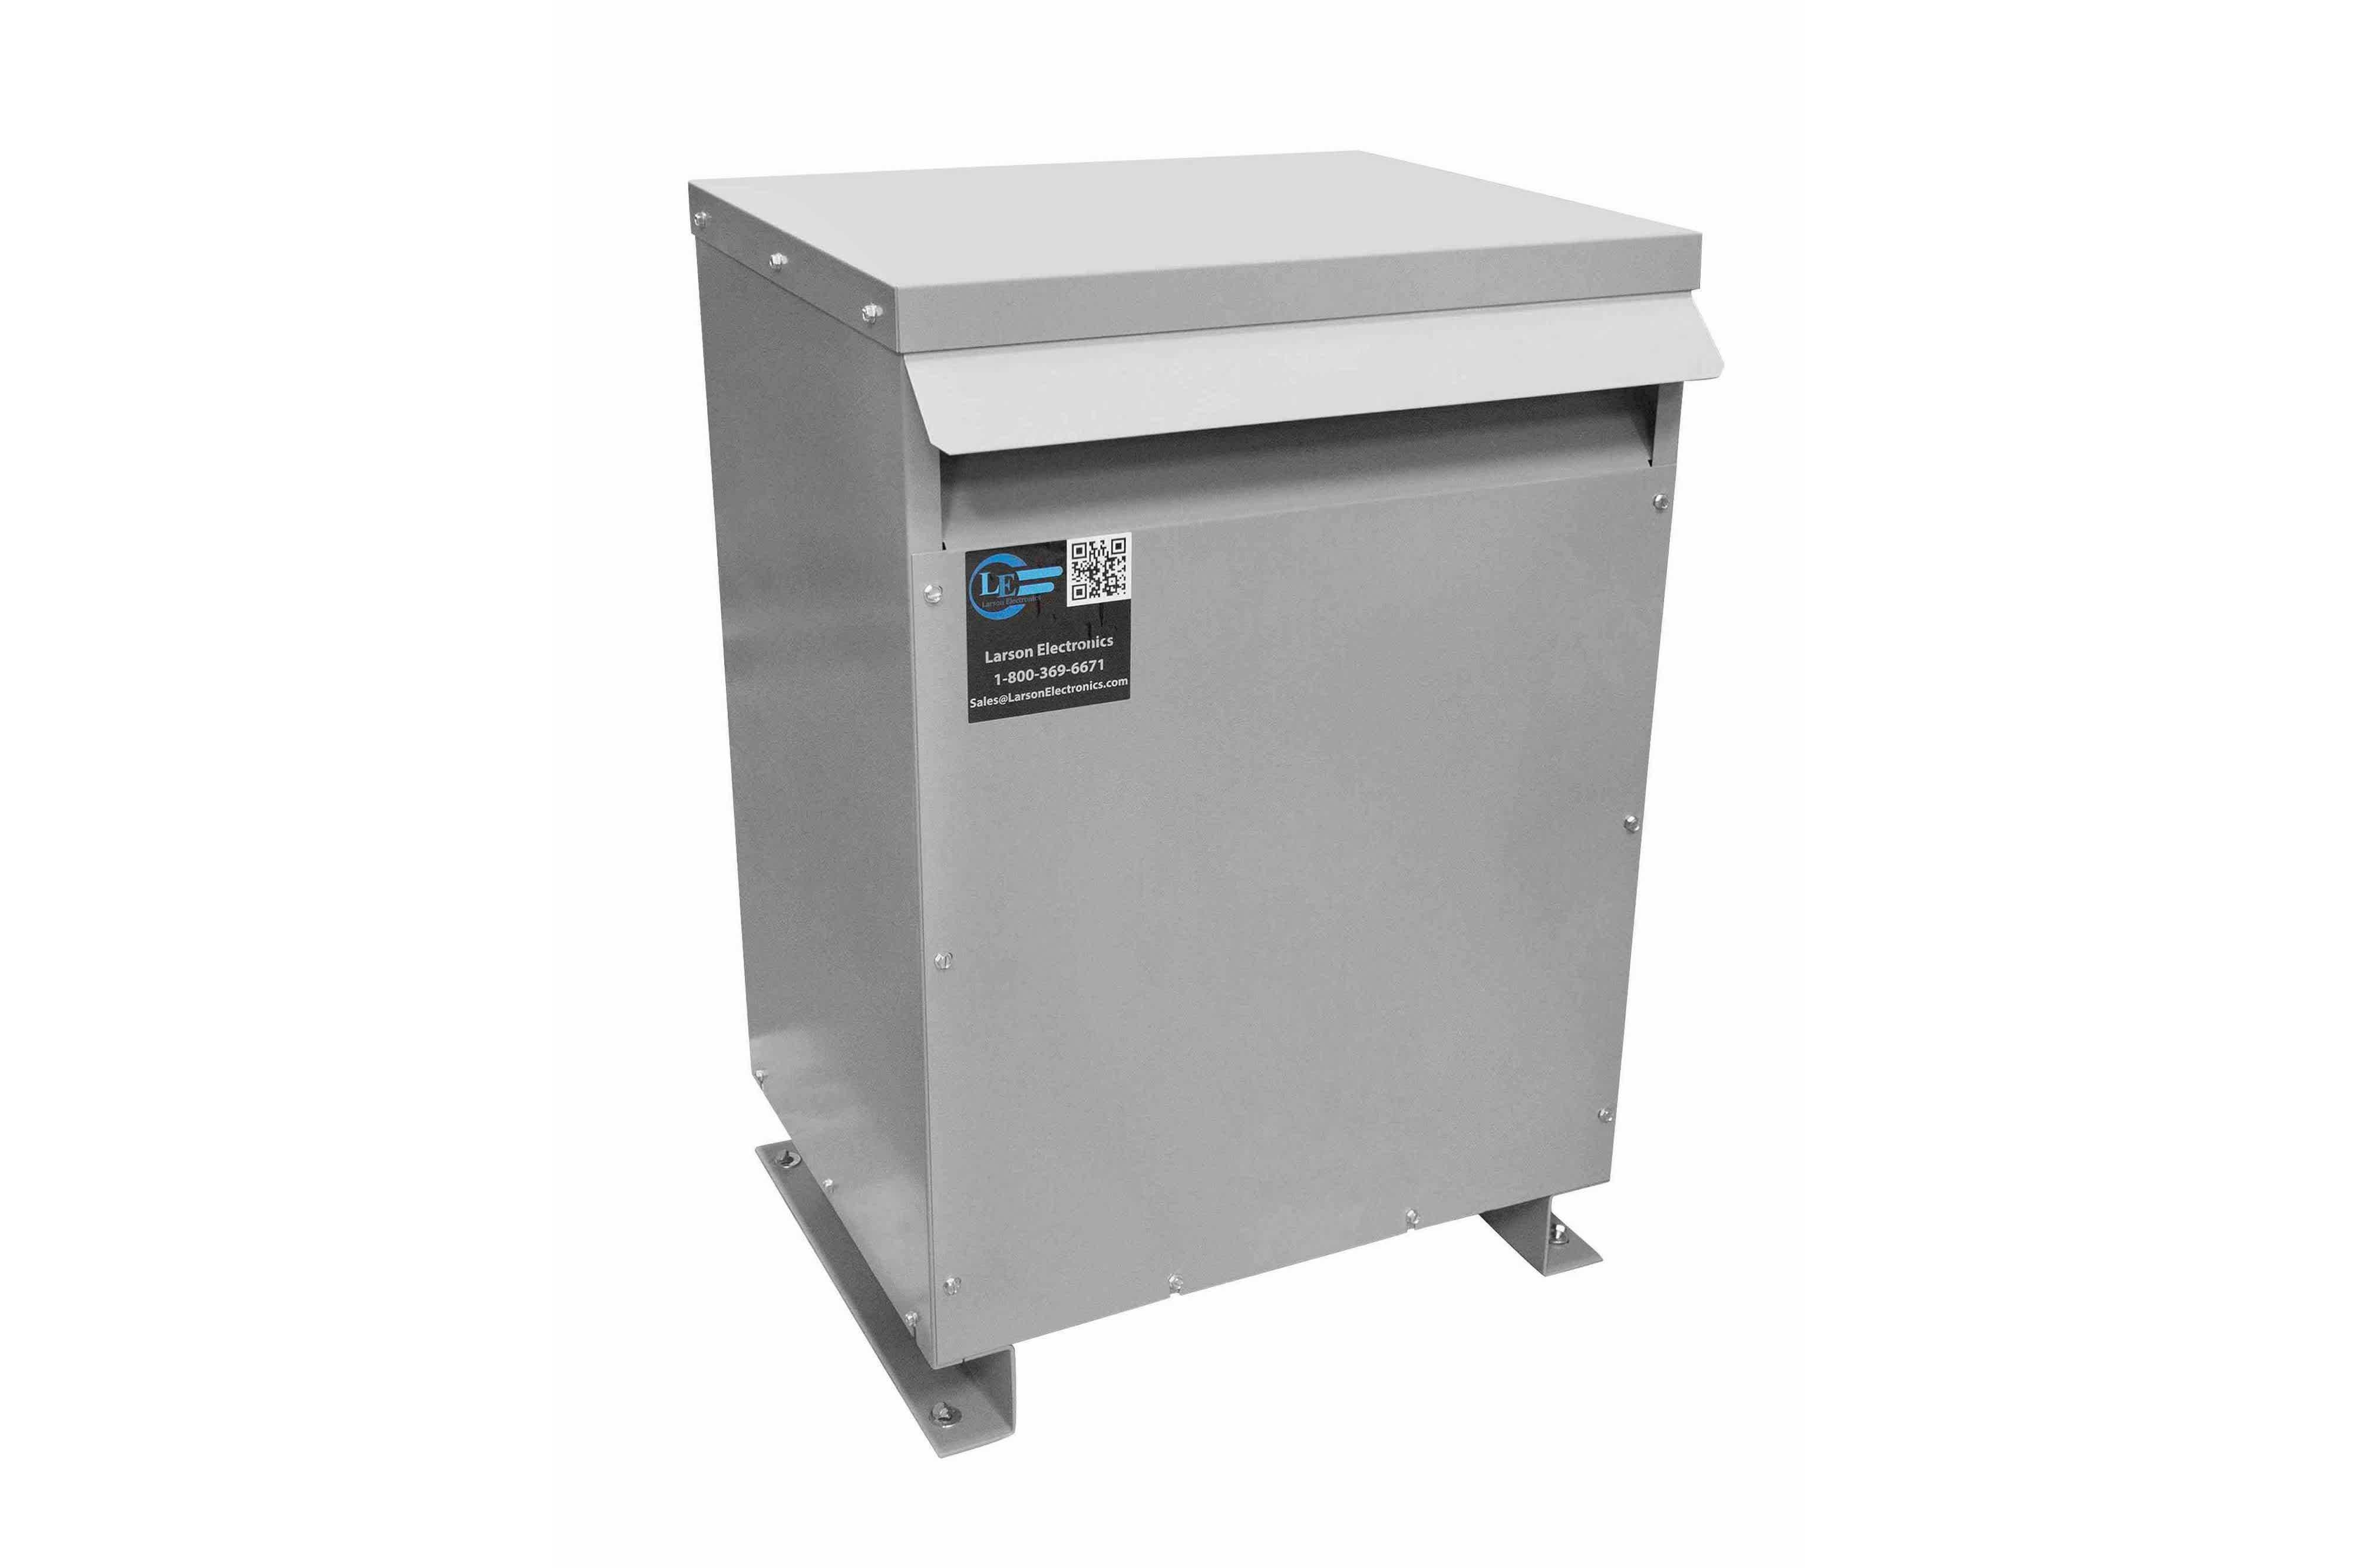 30 kVA 3PH Isolation Transformer, 600V Wye Primary, 240V/120 Delta Secondary, N3R, Ventilated, 60 Hz